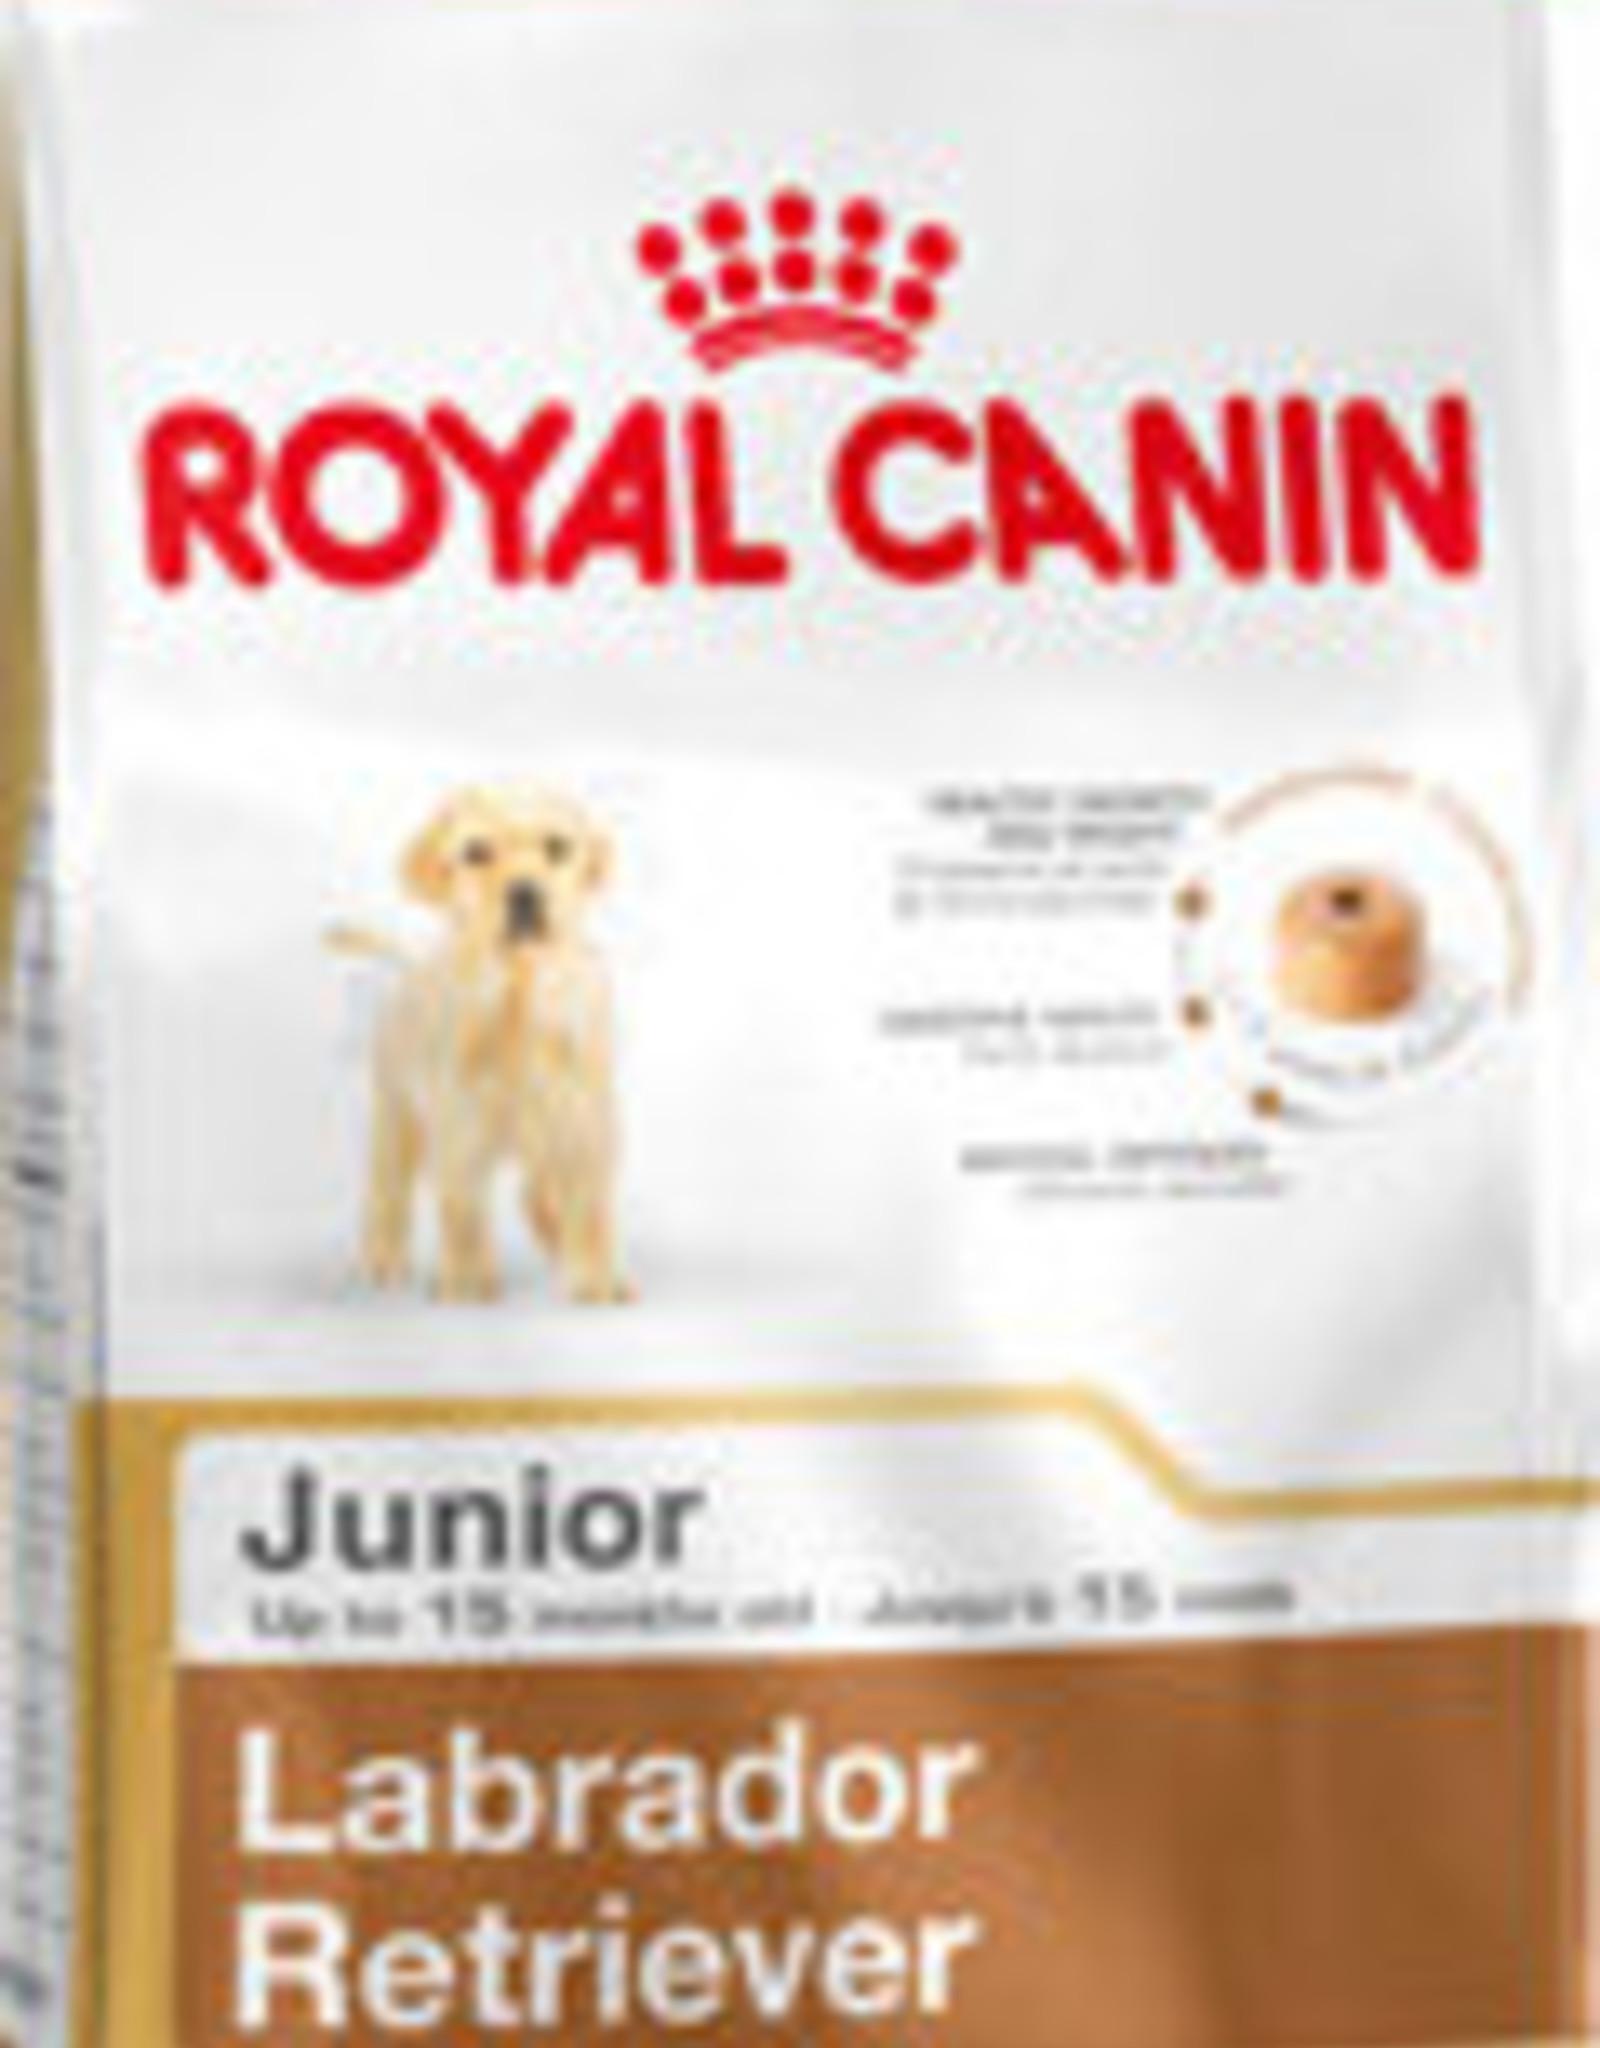 Royal Canin Royal Canin Bhn Labrador Retriever Junior 12kg